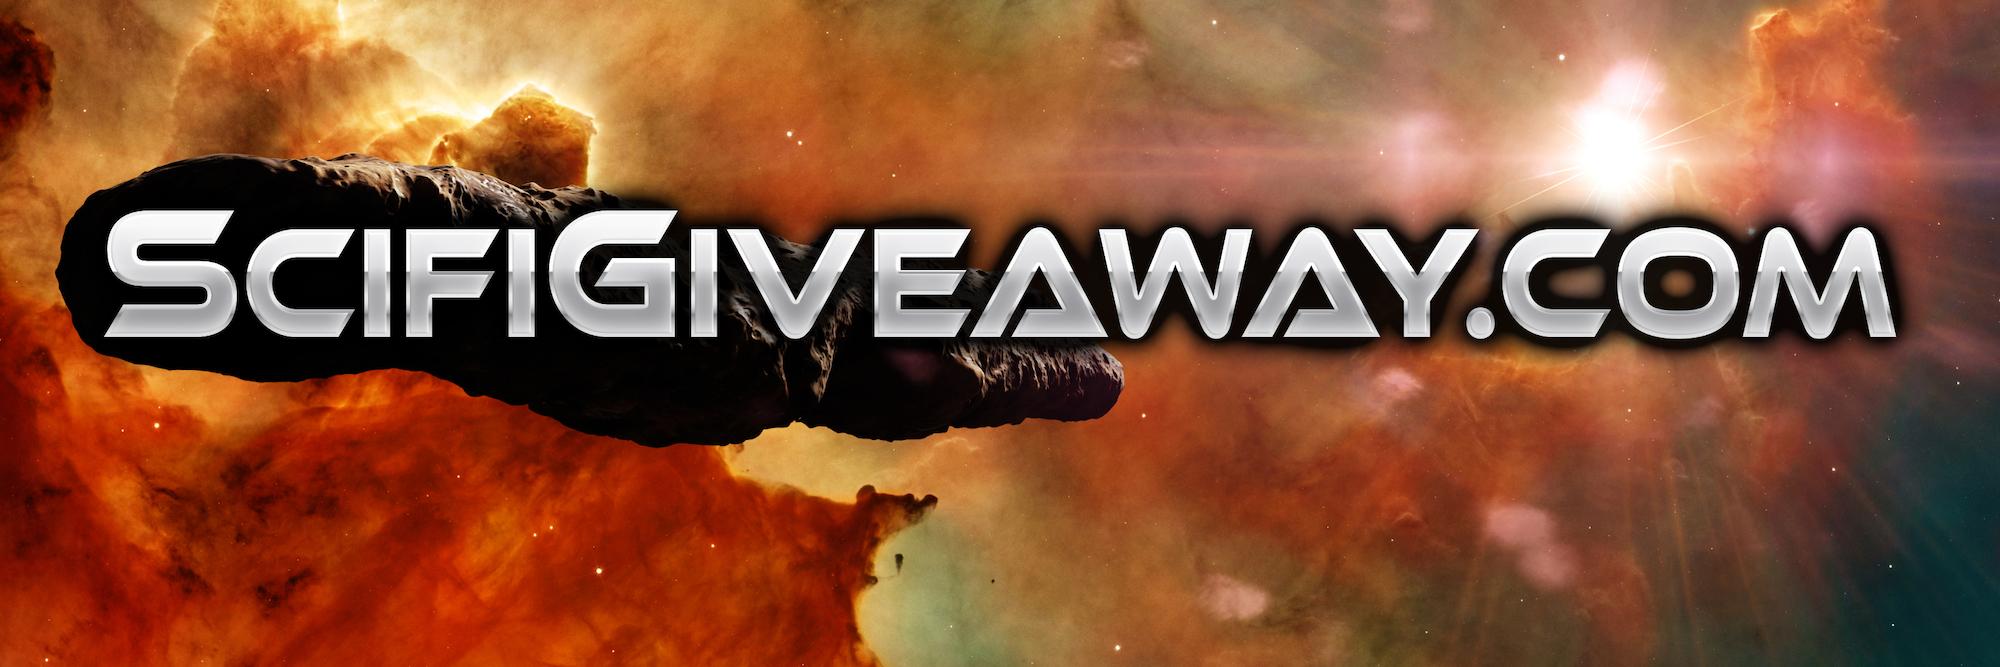 SciFiGiveaway Banner - XL.jpg